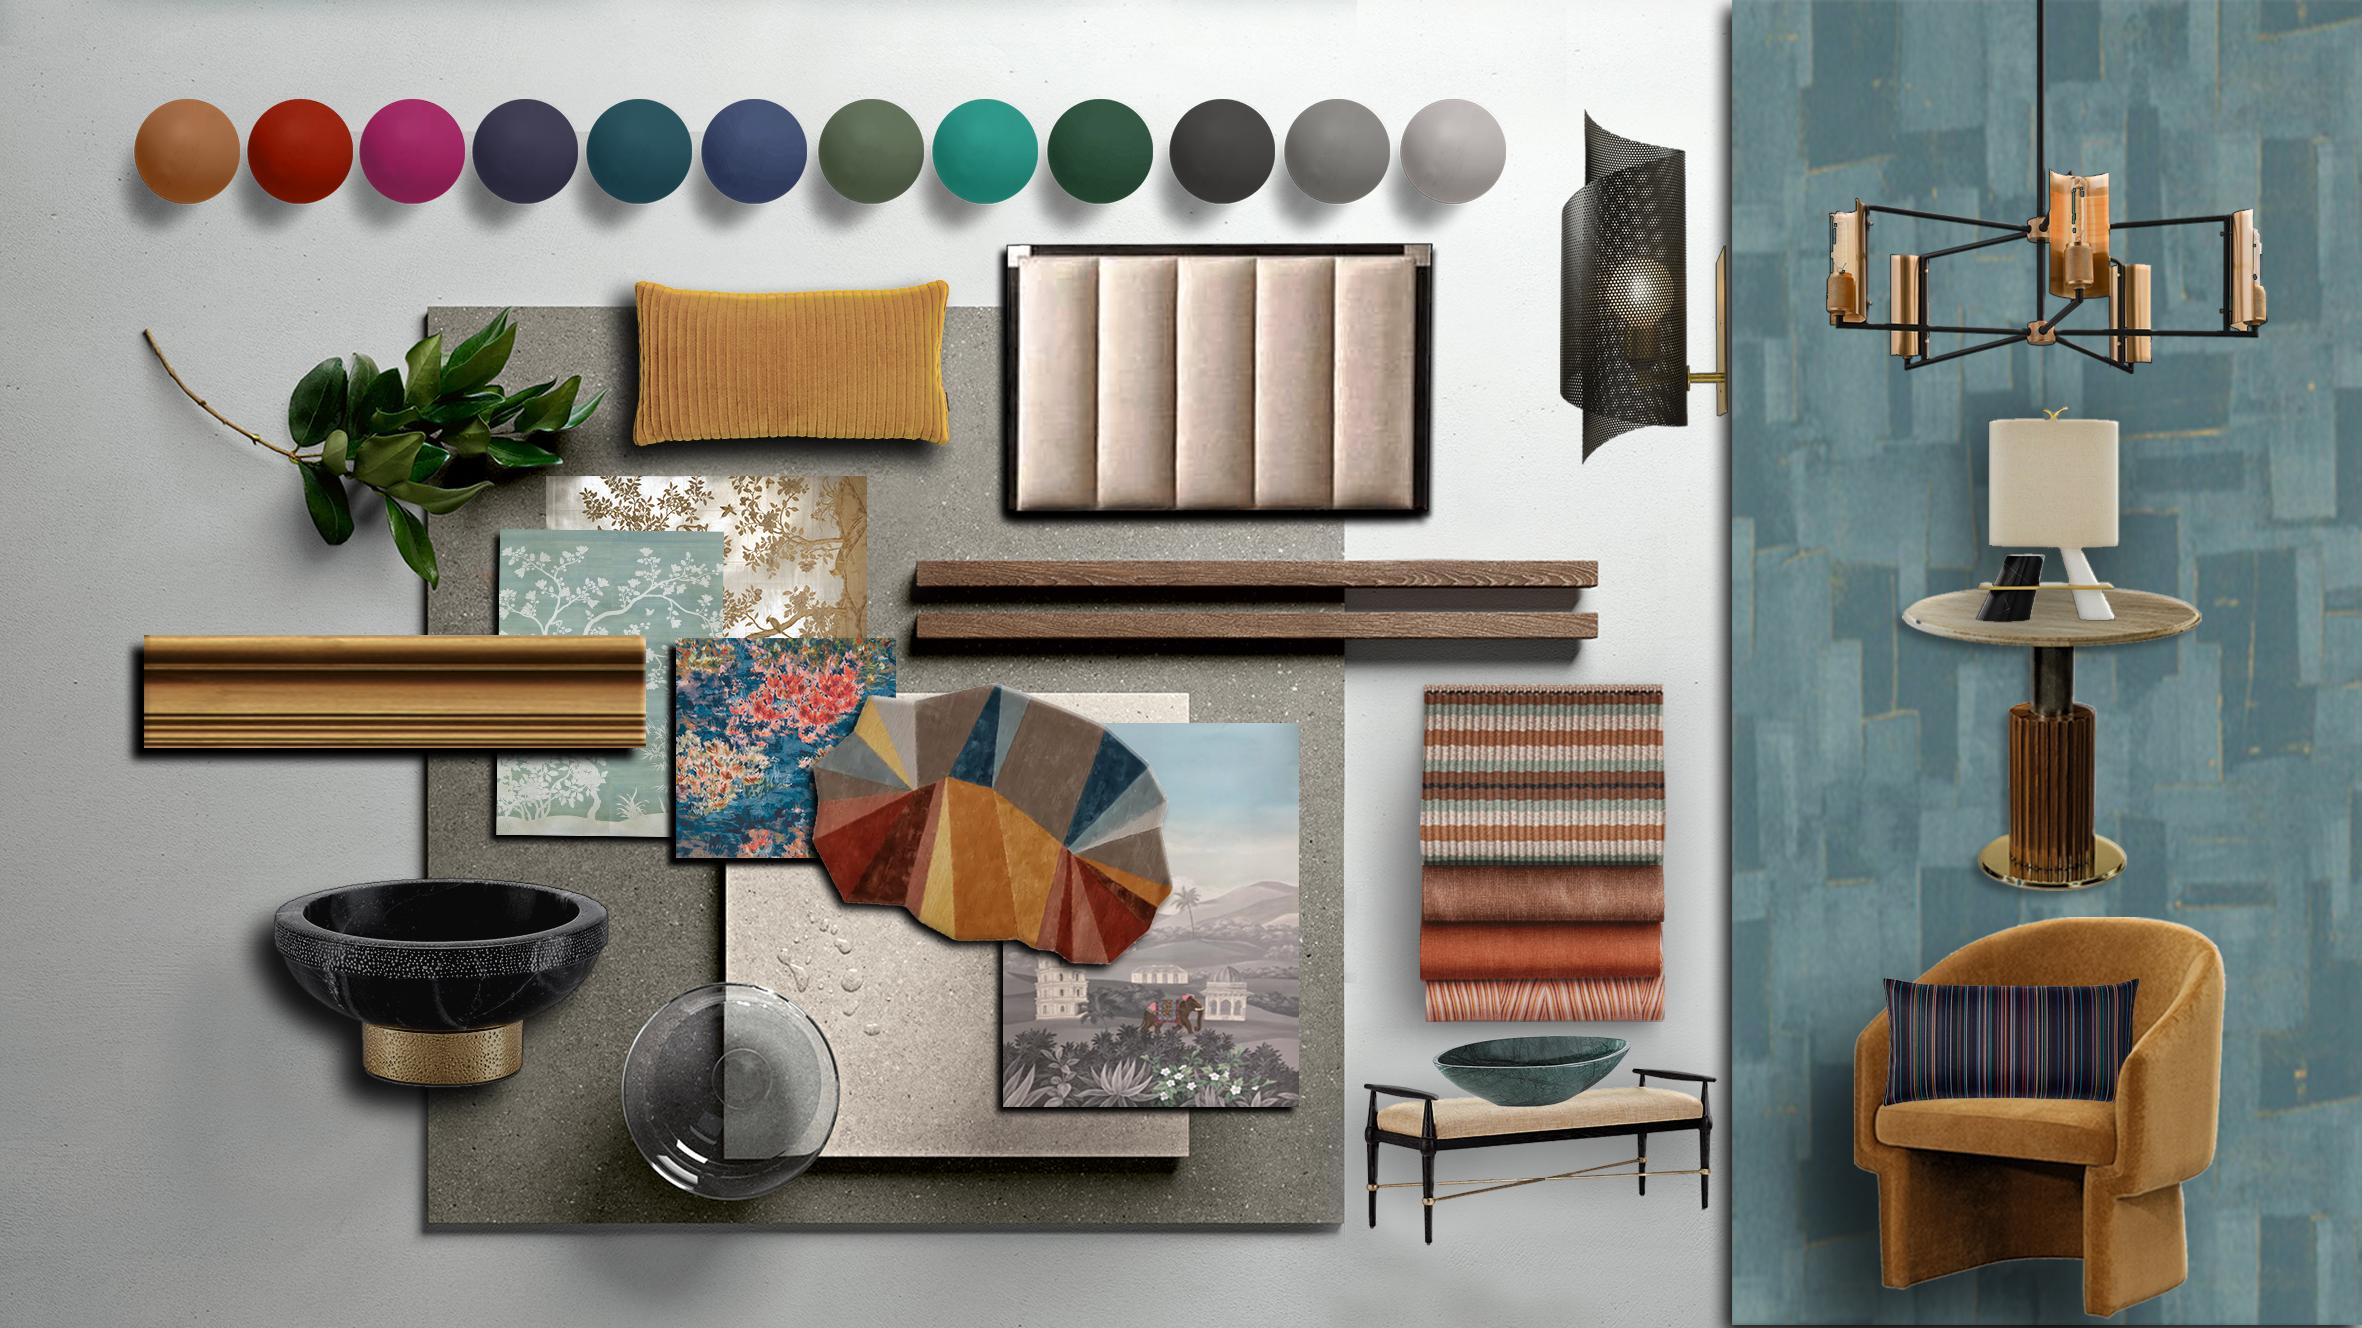 rterior-studio-downtown-la-Kaleidoscope-Project-bedroom-moodboard